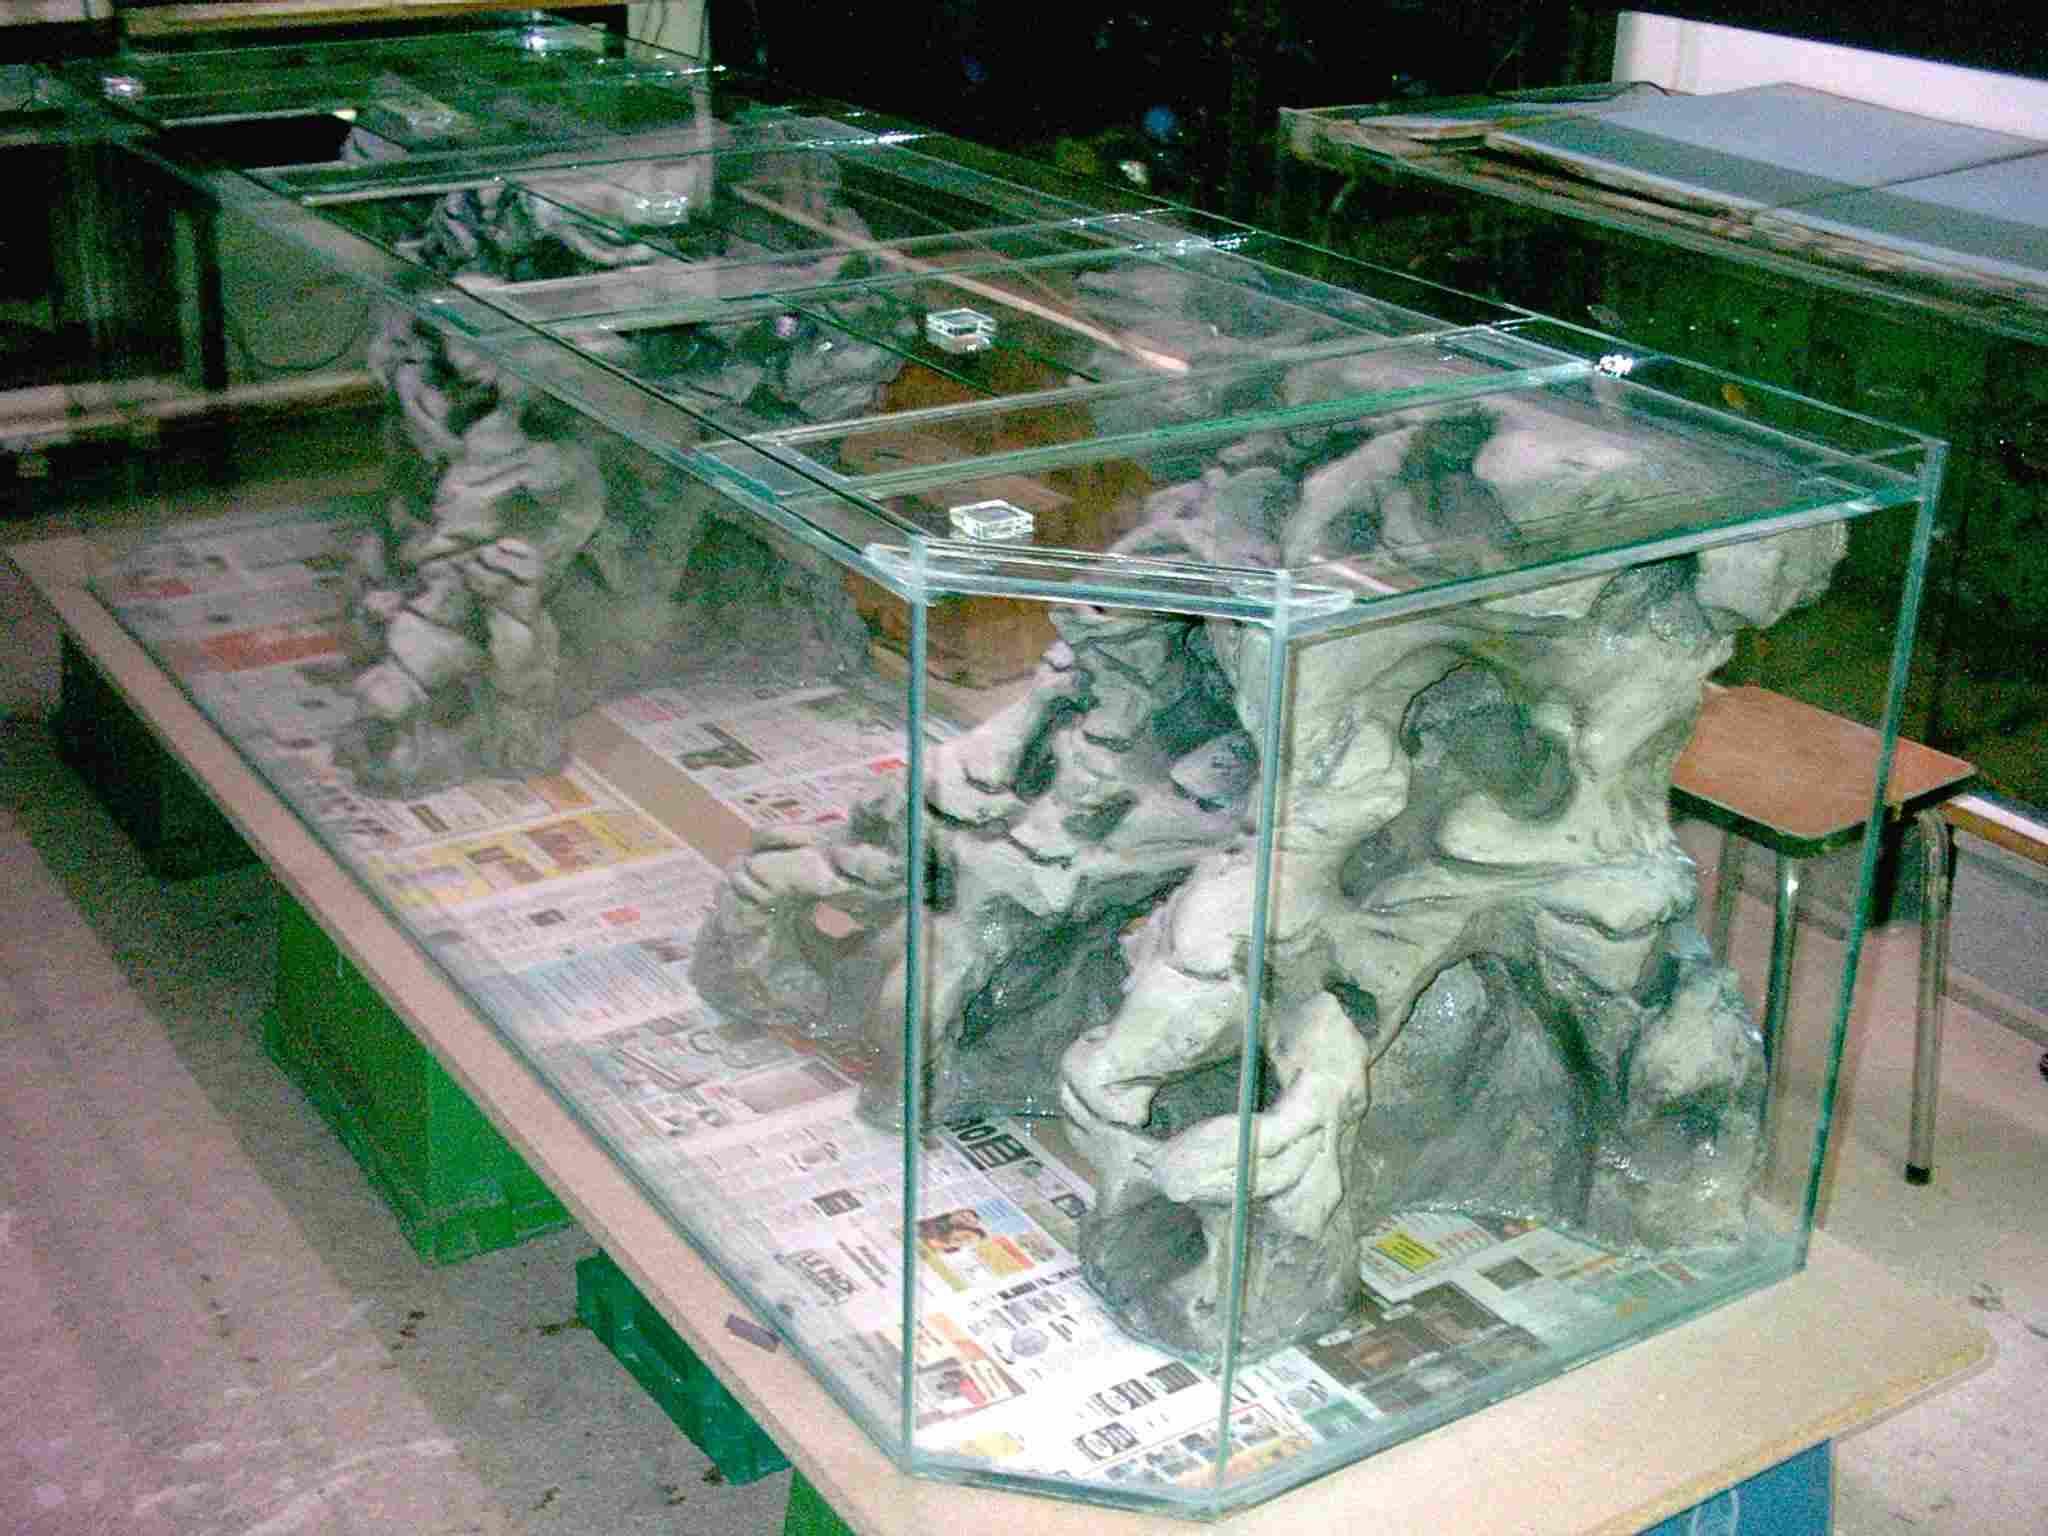 Aquaplum 39 coraux fabrication d 39 aquariums for Aquarium eau douce